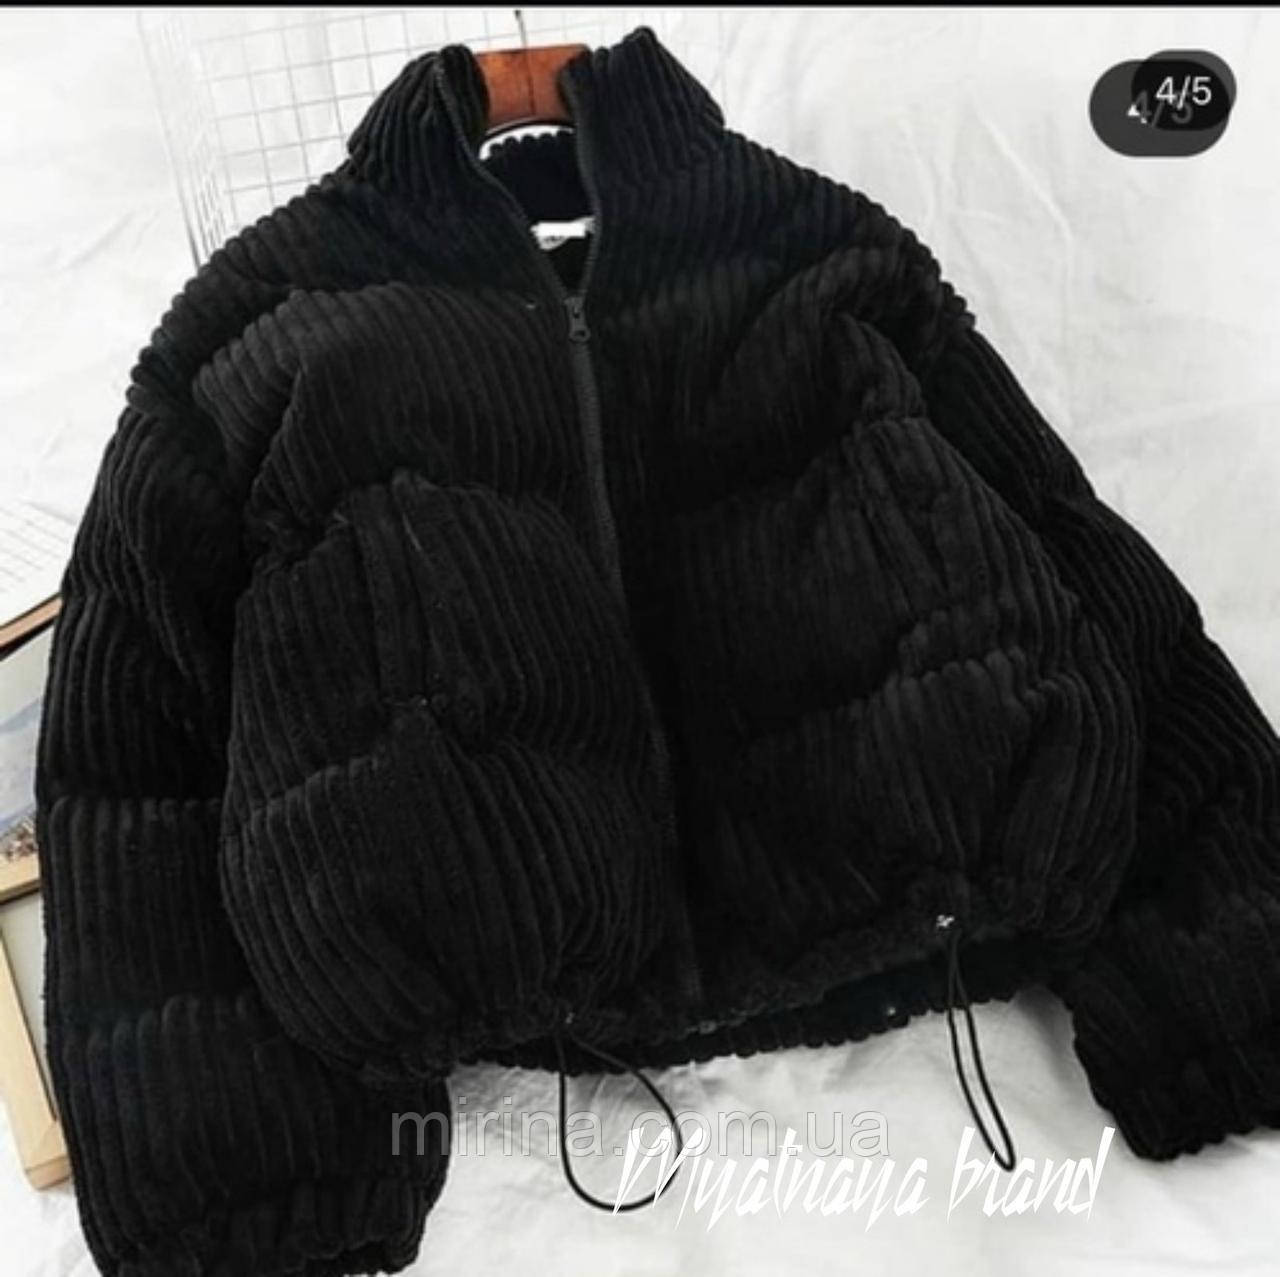 Куртка вельветовая на холофайбере, зима, четыре цвета